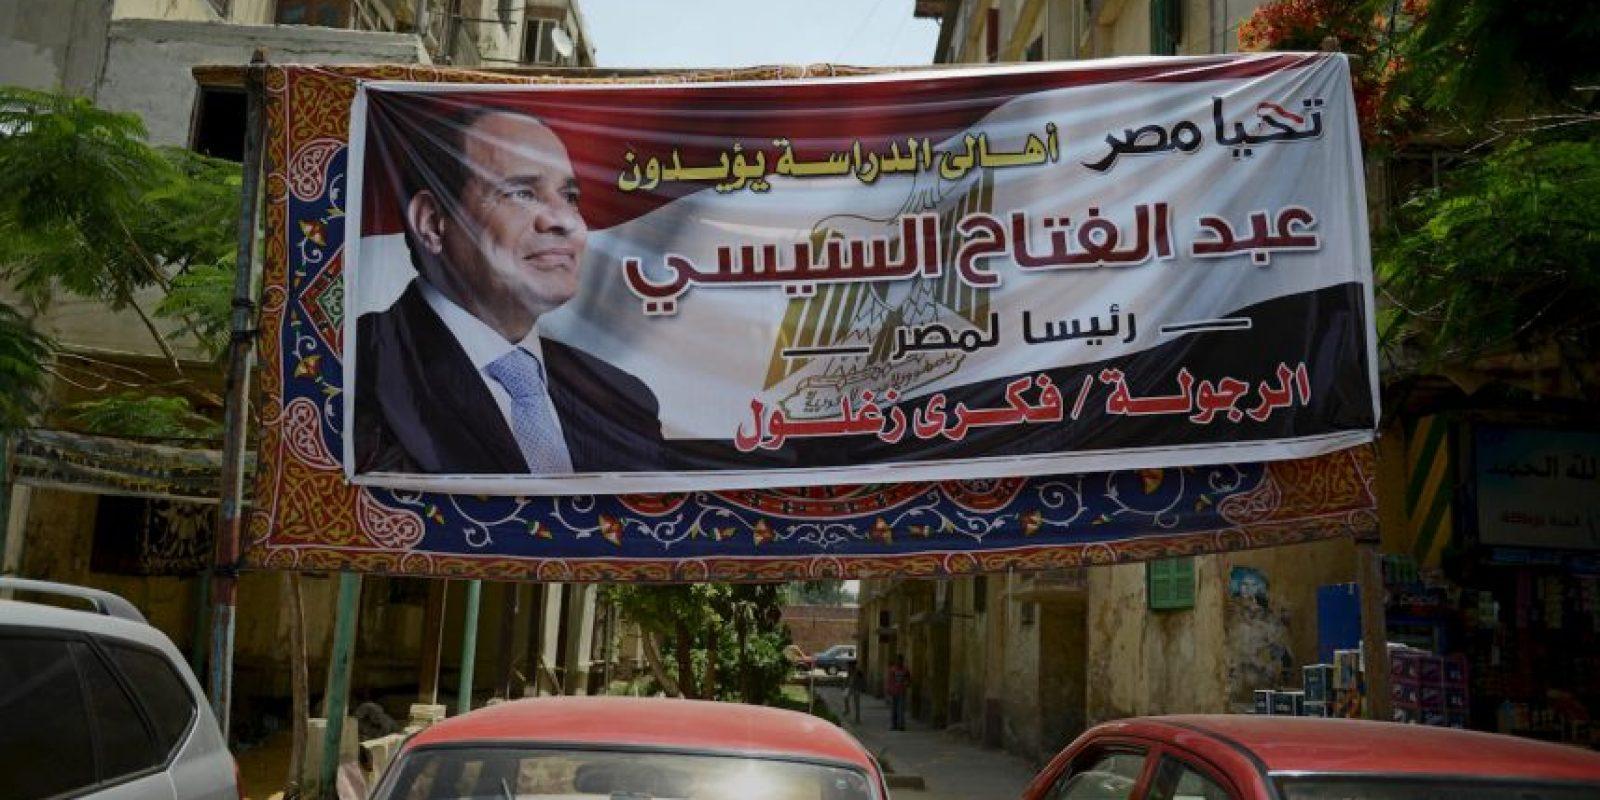 Ahora ex jefe militar, Abdel Fatah Al Sisi, gobierna Egipto. Foto:Getty Images